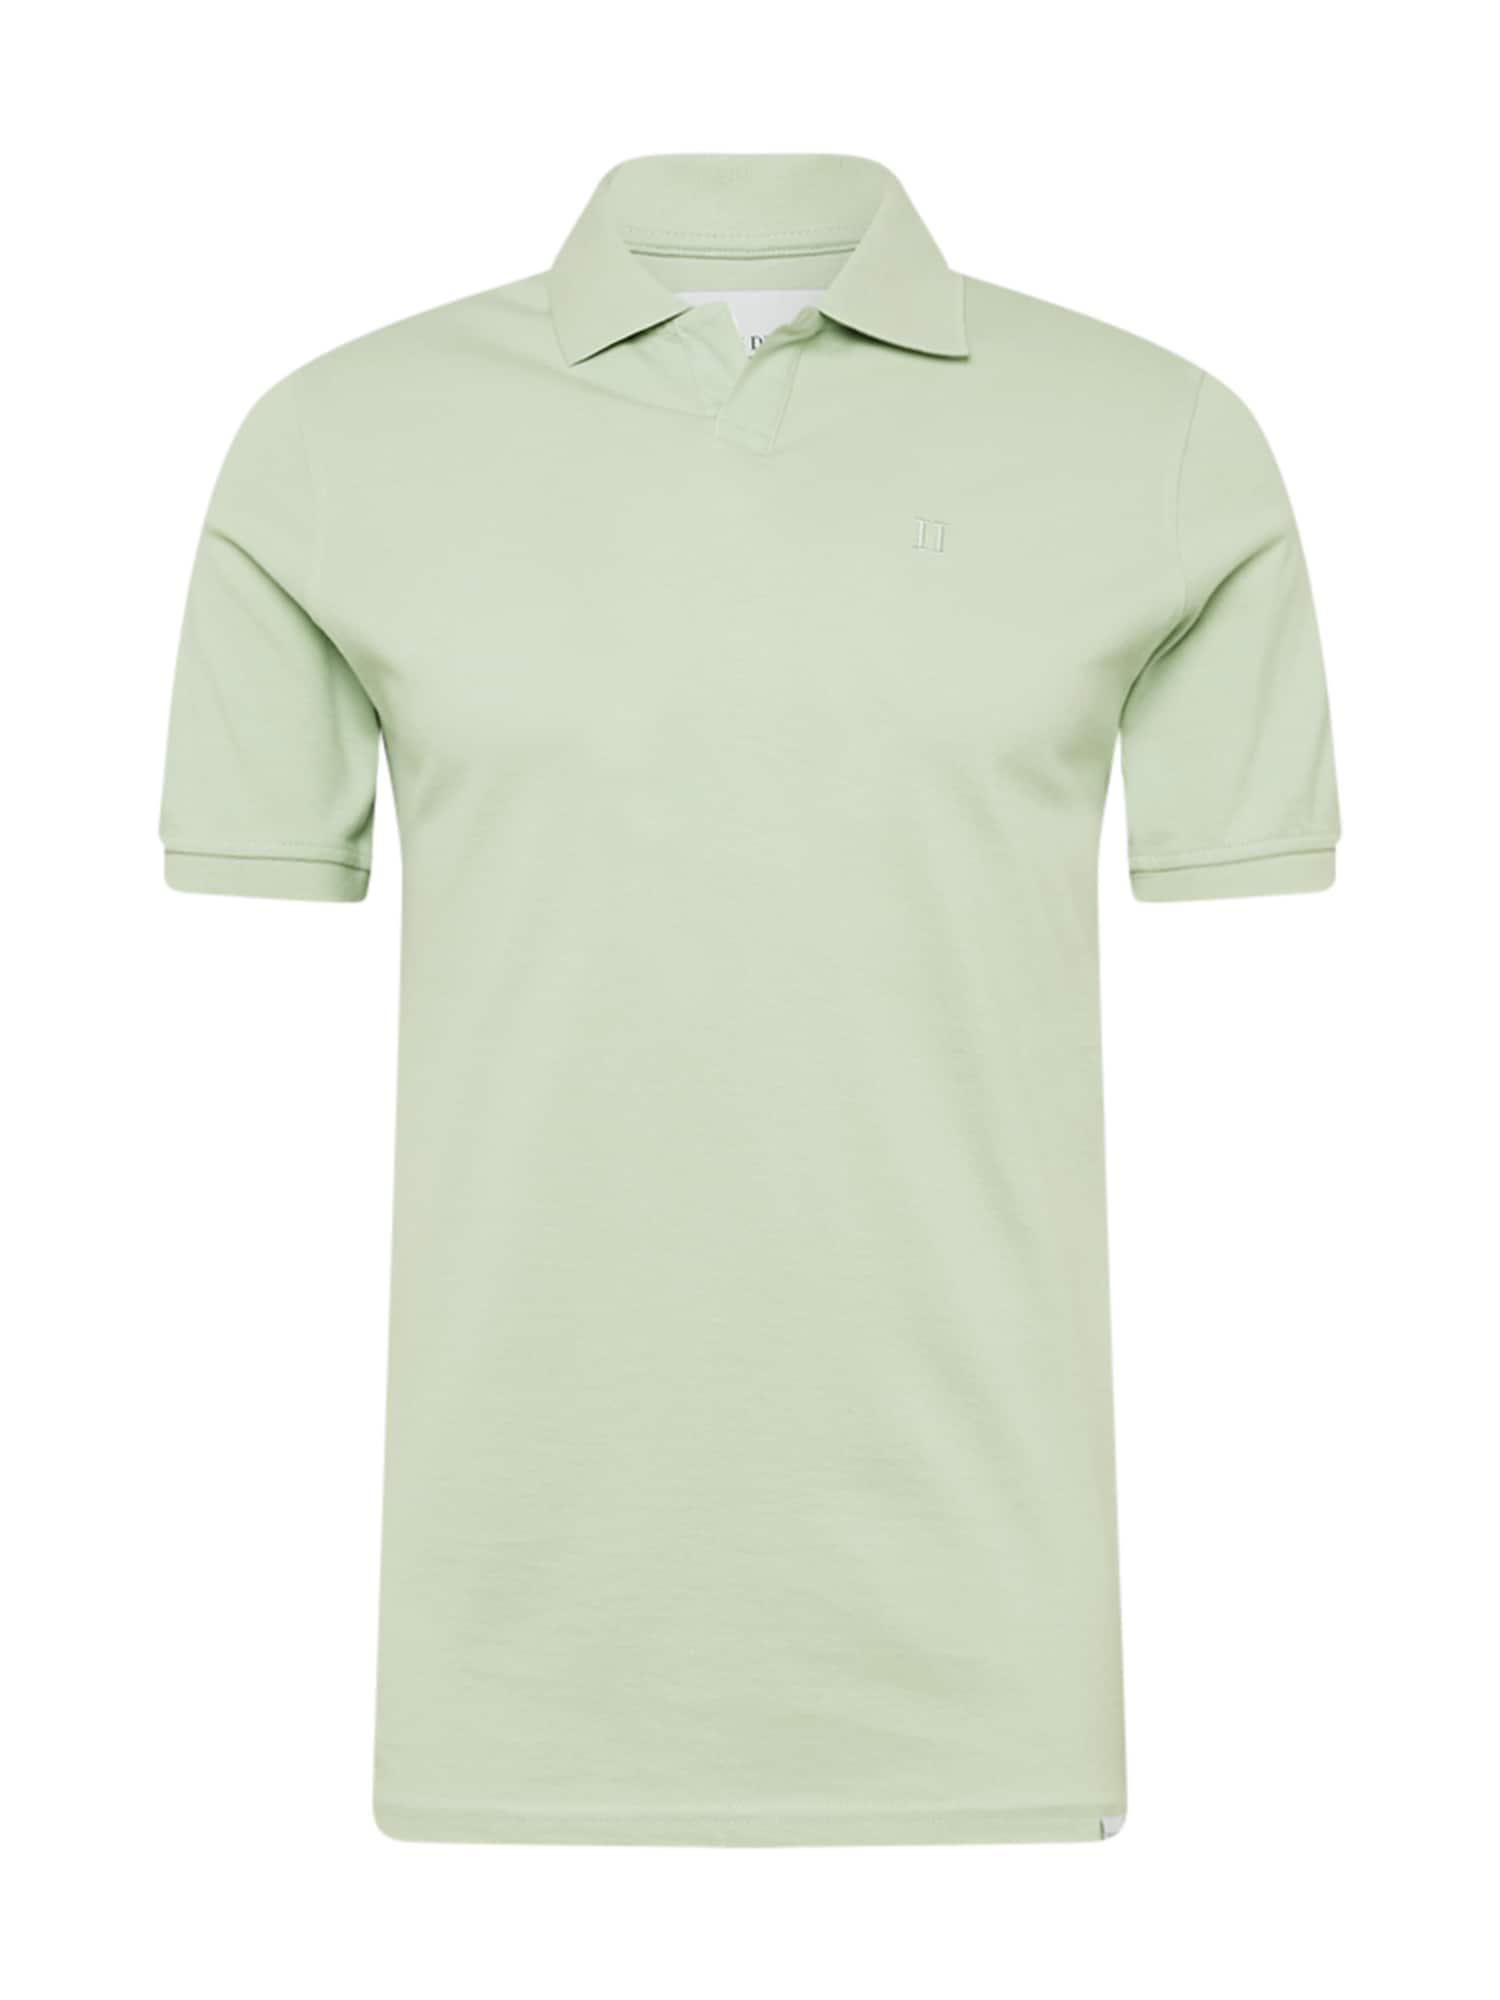 Les Deux Marškinėliai mėtų spalva